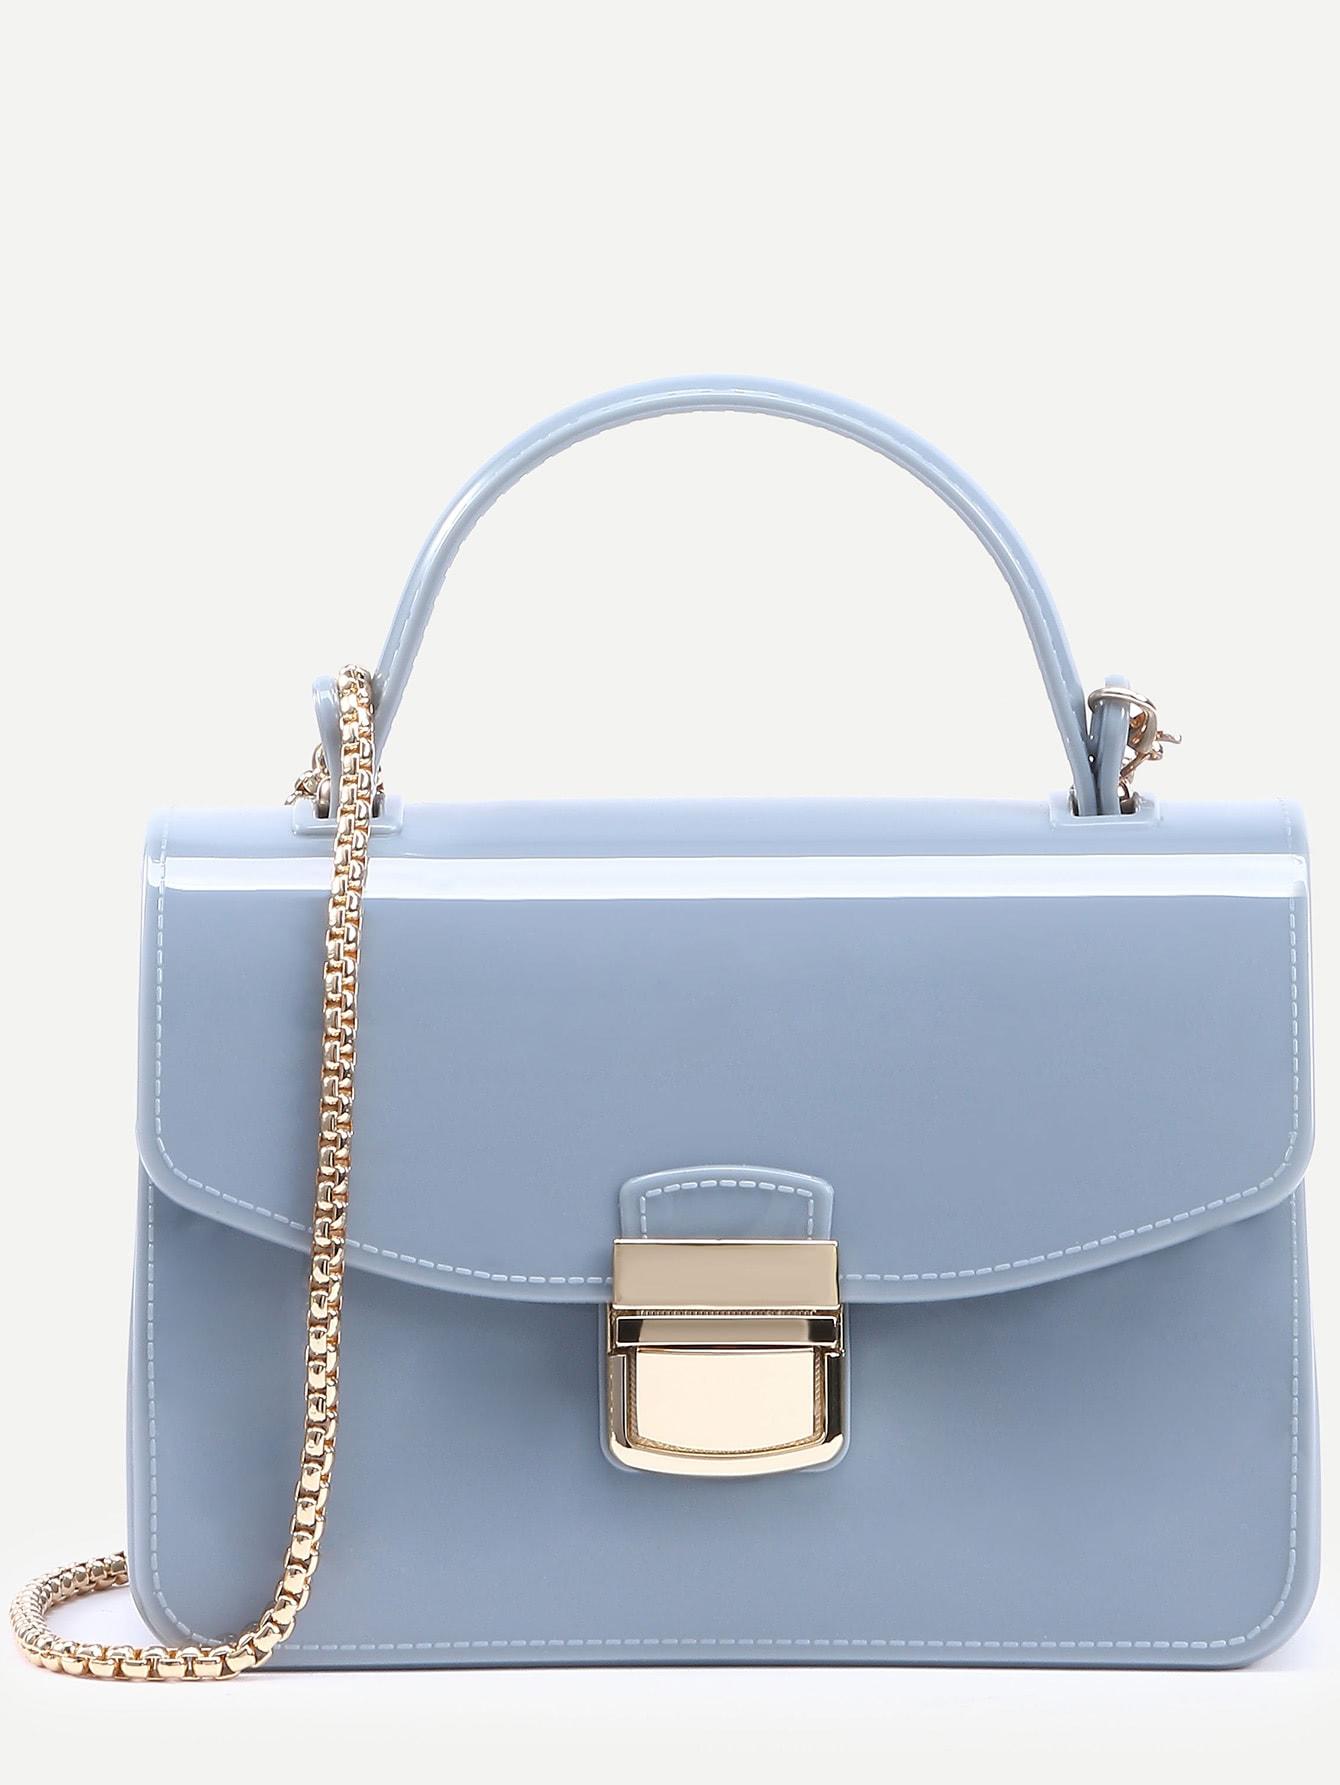 Baby Blue Pushlock Flap Handbag With Chain